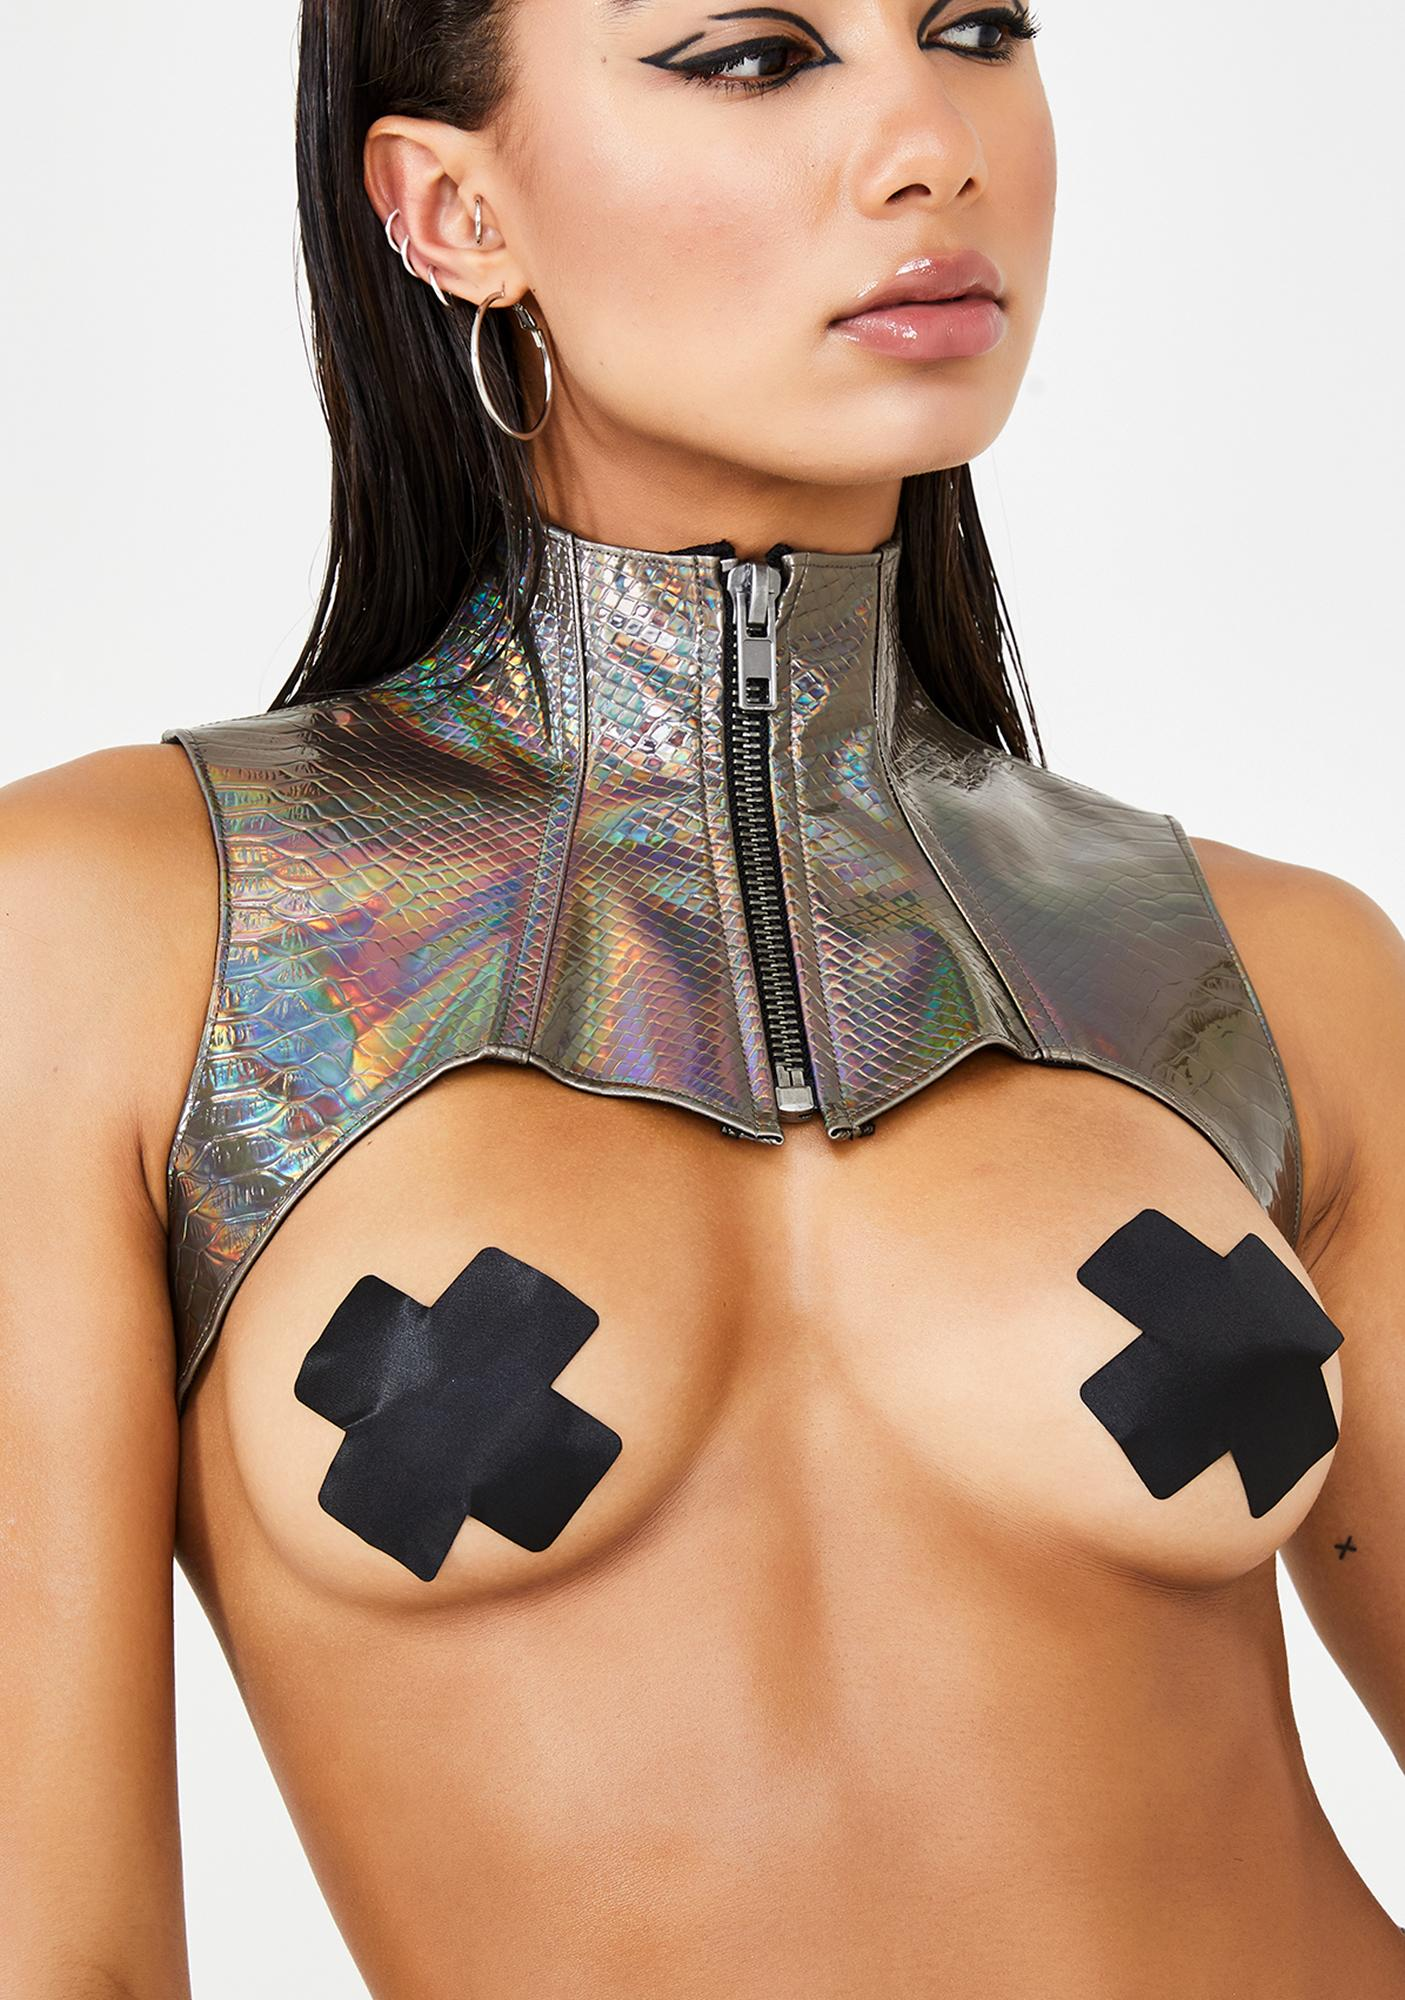 Club Exx Bronze Deadly Dose Snakeskin Harness